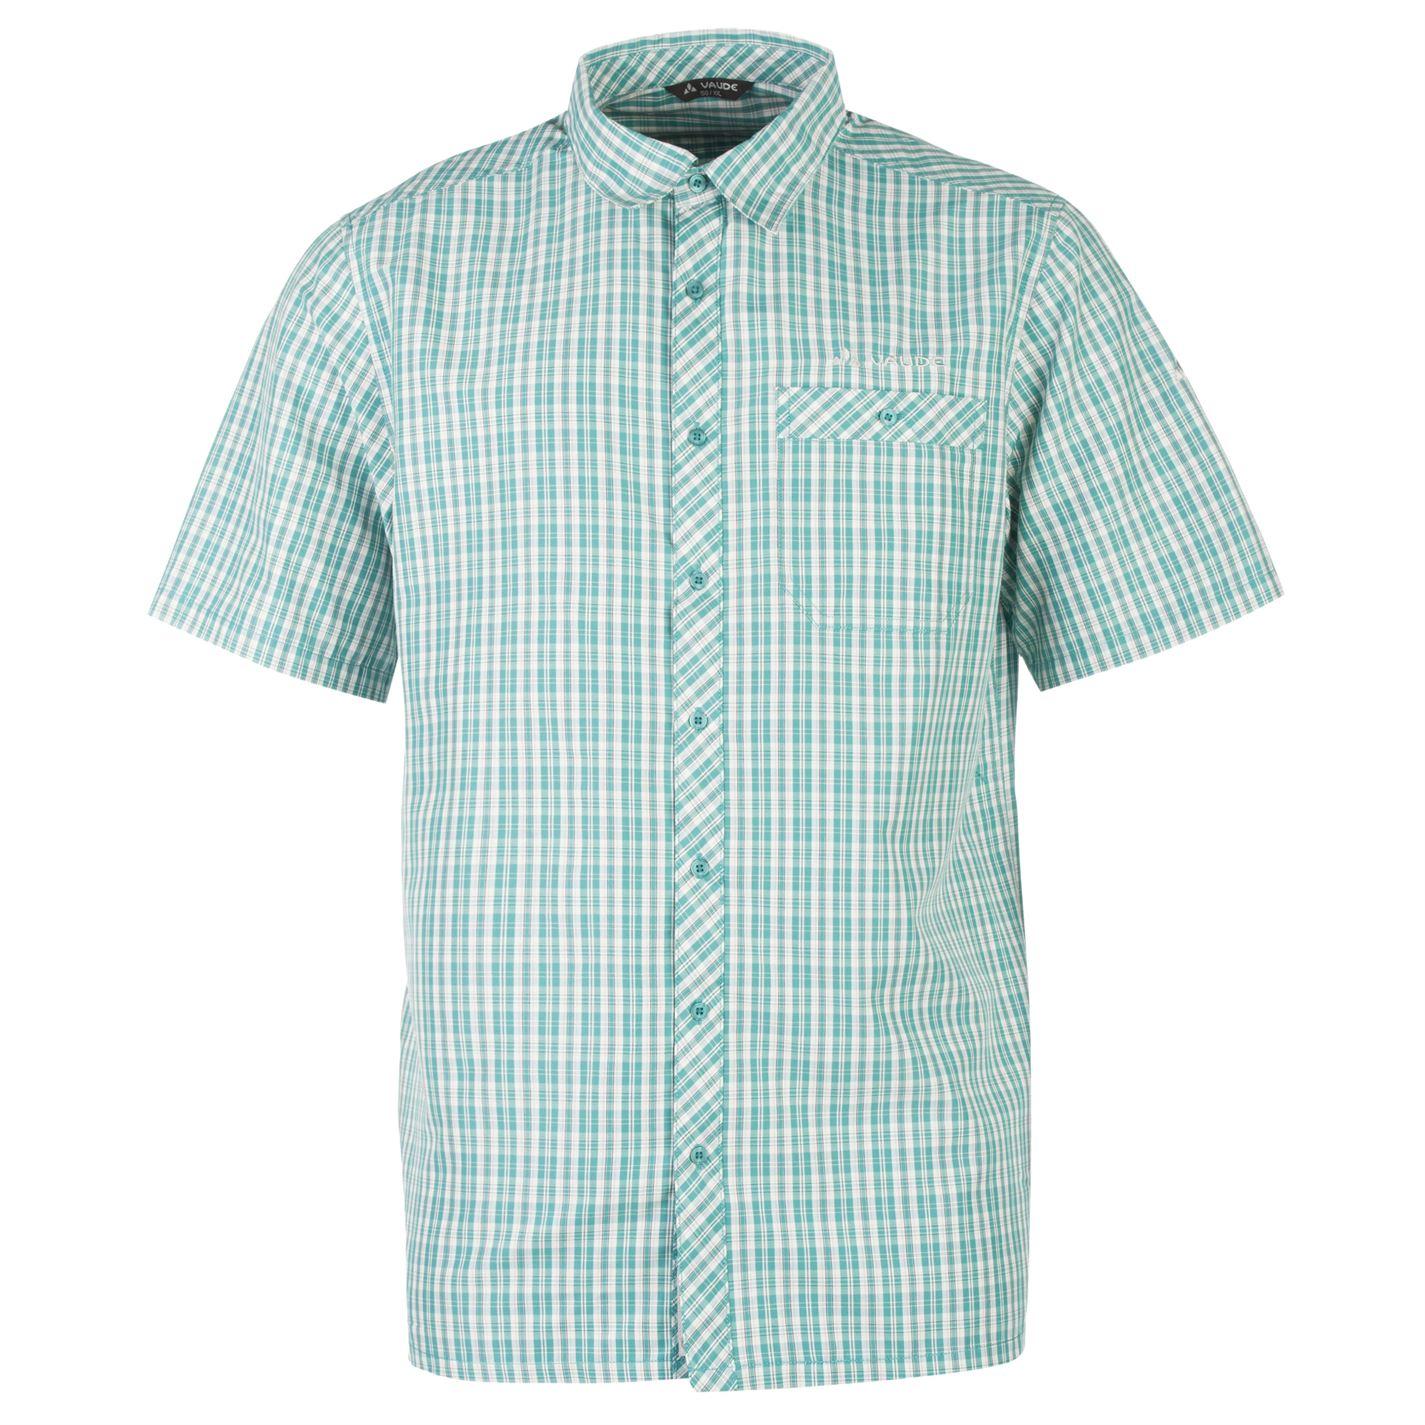 Vaude Landruk Shirt Mens